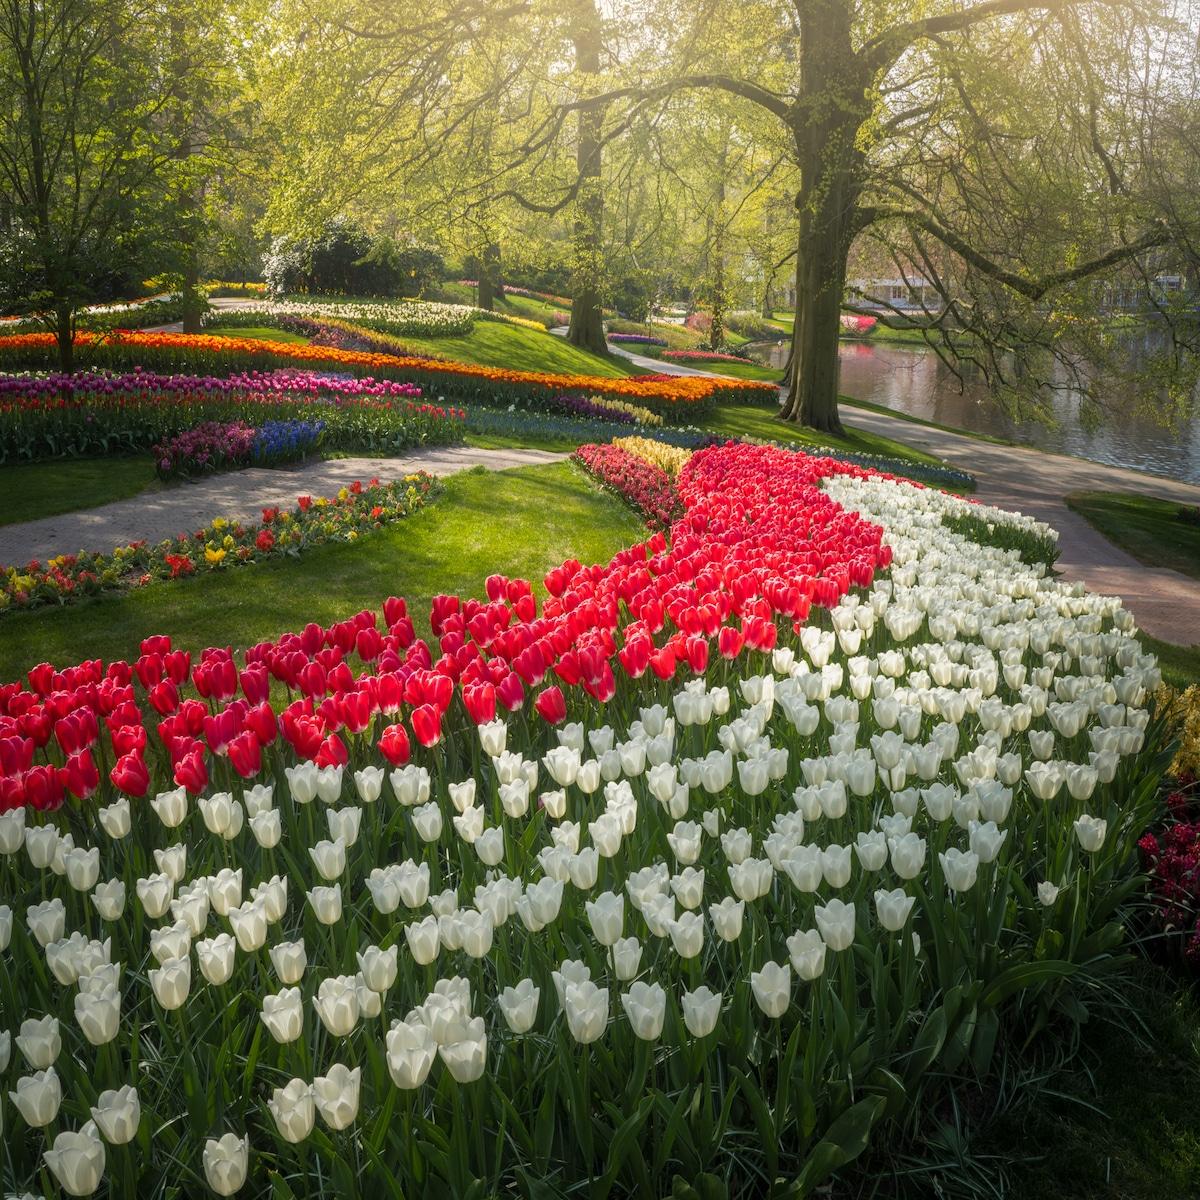 Keukenhof Garden by Albert Dros